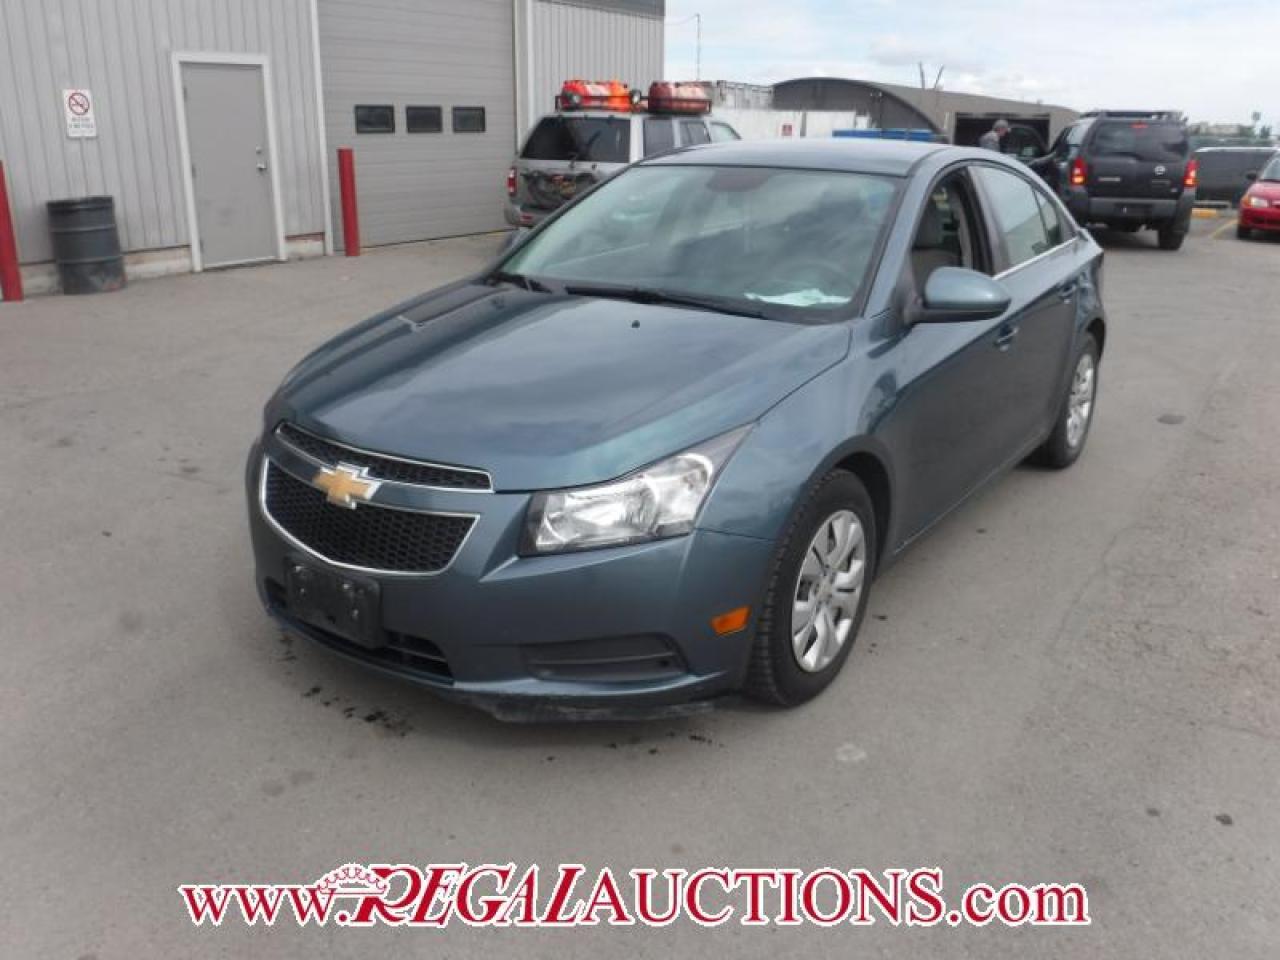 Photo of Blue 2012 Chevrolet CRUZE LT 4D SEDAN TURBO 1.4L